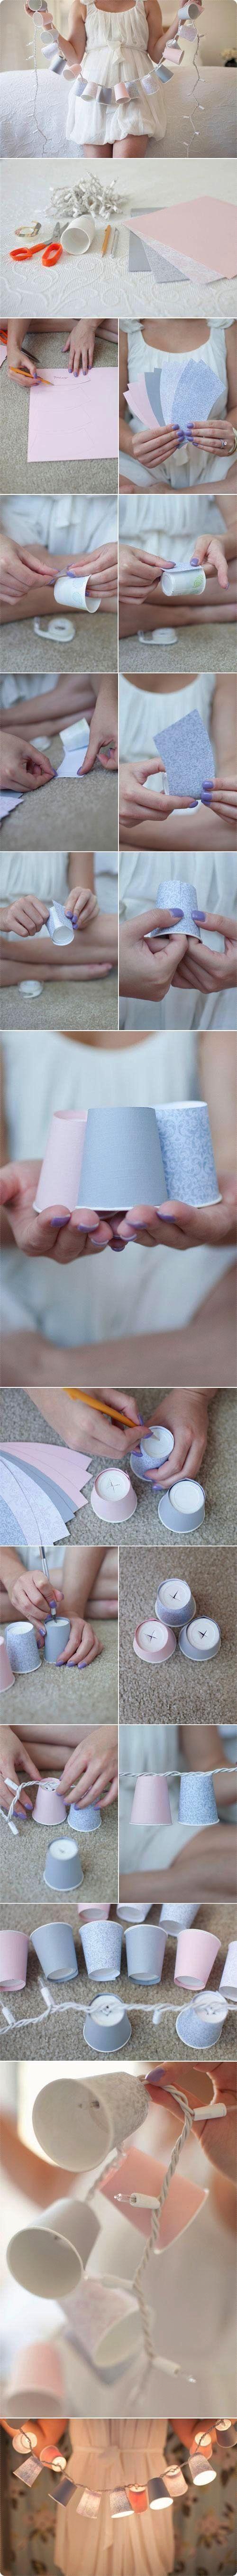 Pretty cool! DIY Paper Cup Lights